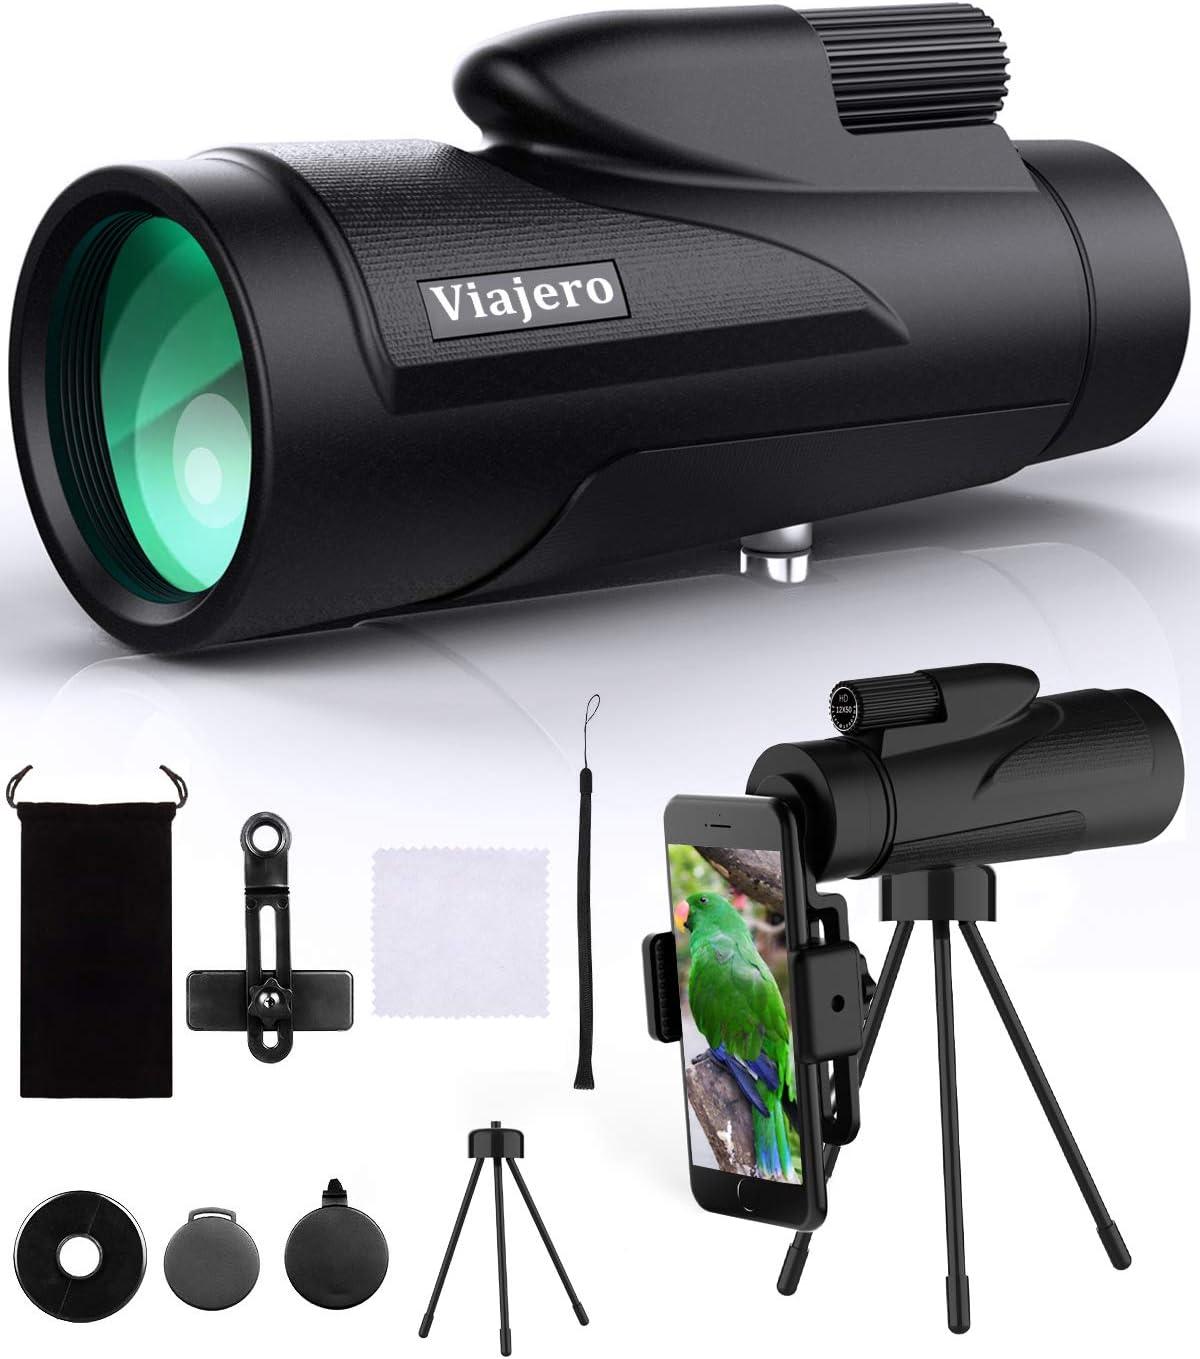 Viajero 12X50 Monocular Telescope 55% OFF Finally popular brand Sma with Power High